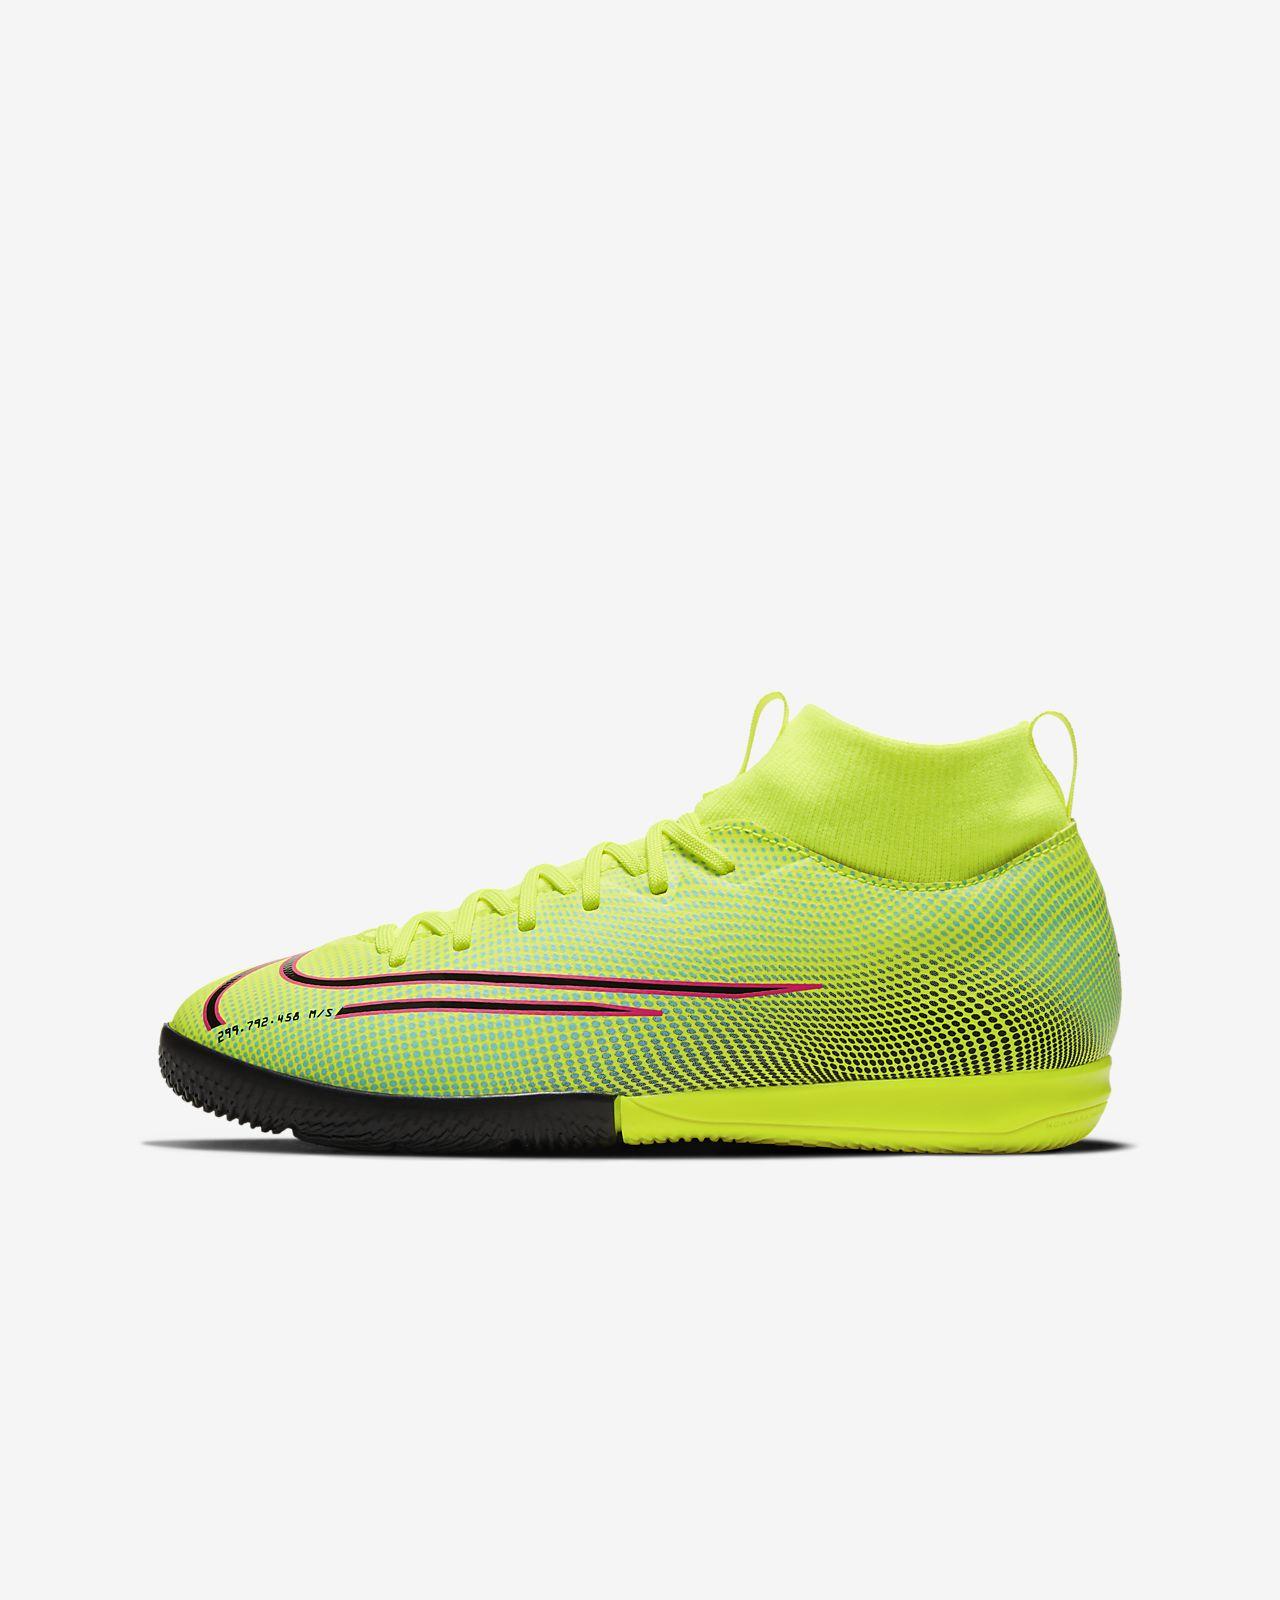 chaussure nike foot salle enfant